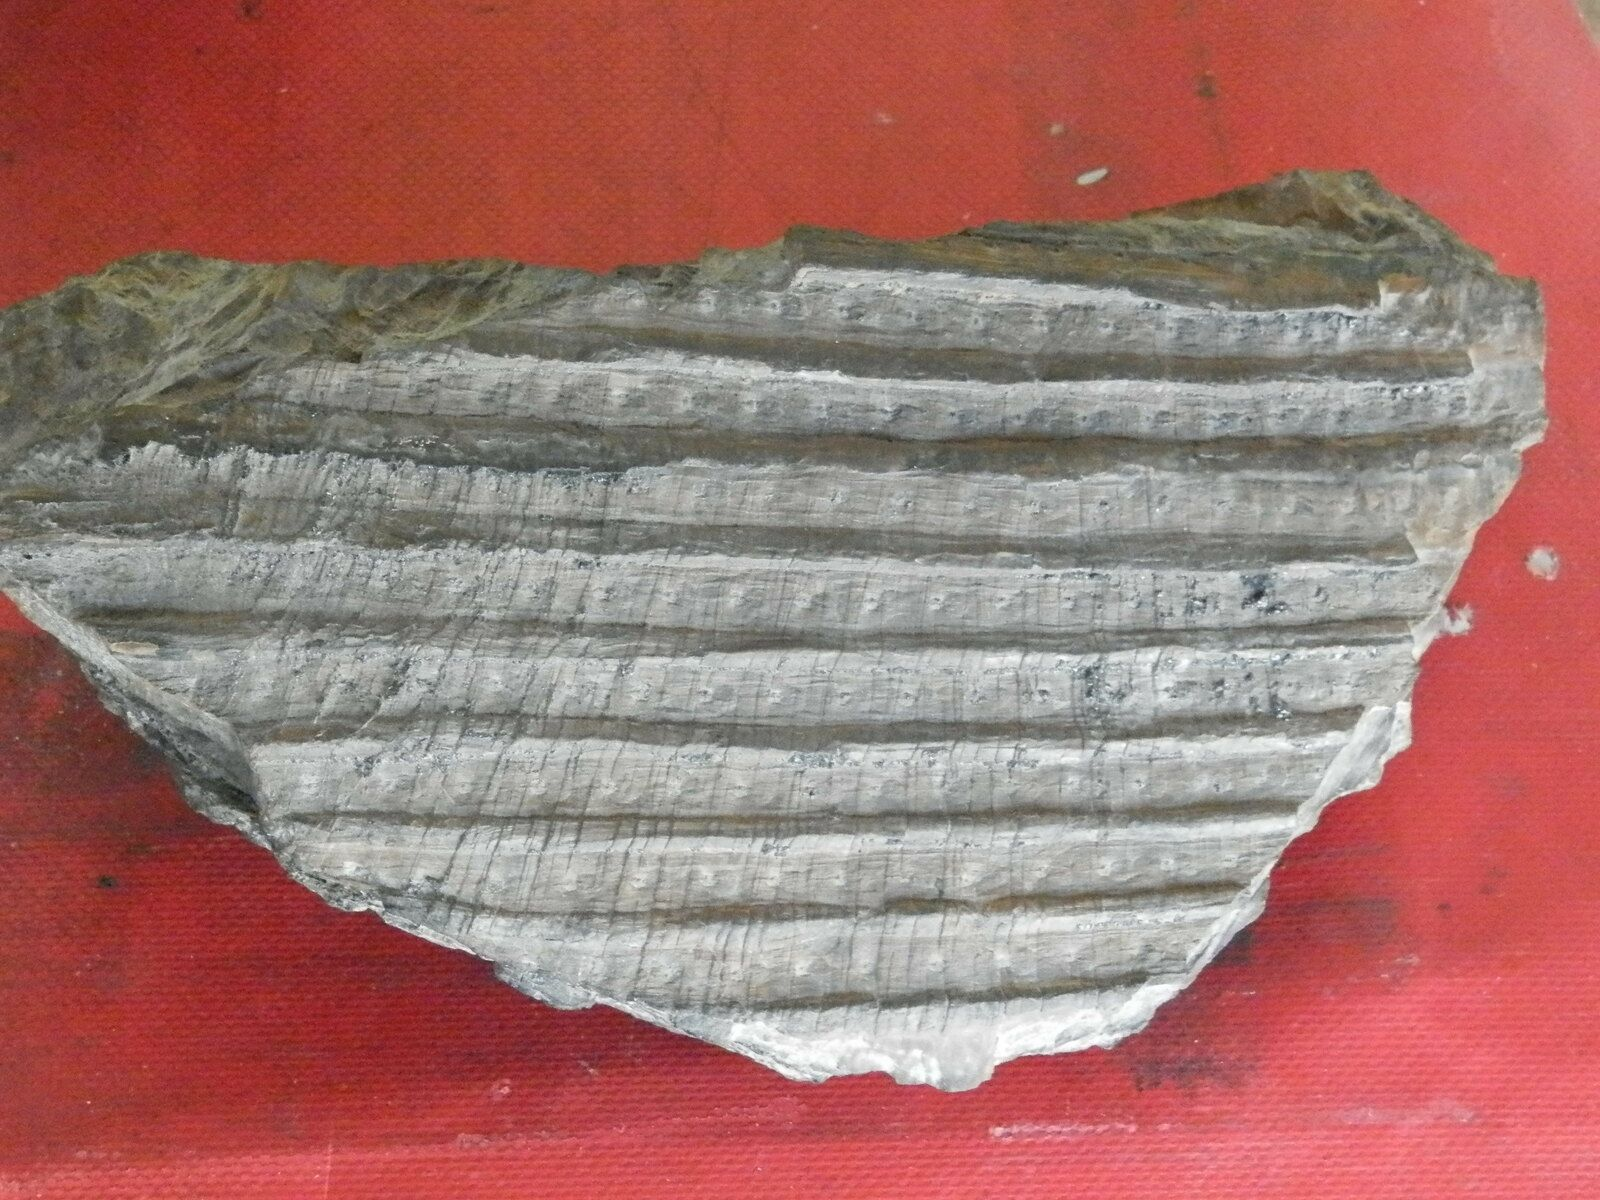 Bois Fossile ( Graissesac ) - goelandmedia.prod@gmail.com (c) - Hérault - Occitanie